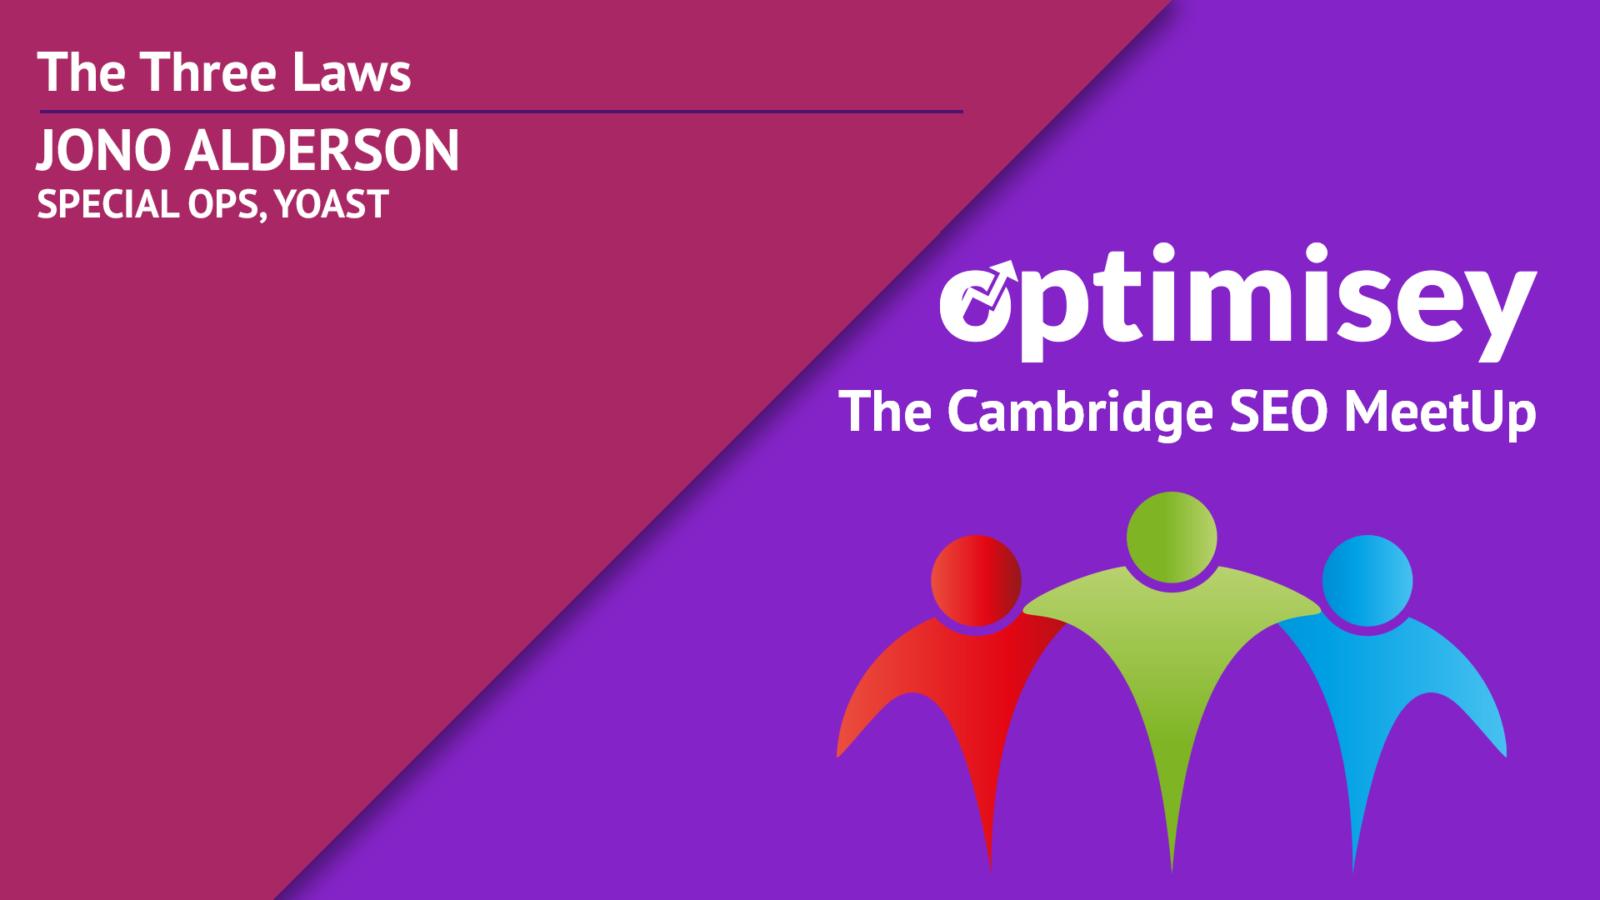 Opening slide for Jono Alderson's talk at the Optimisey SEO event